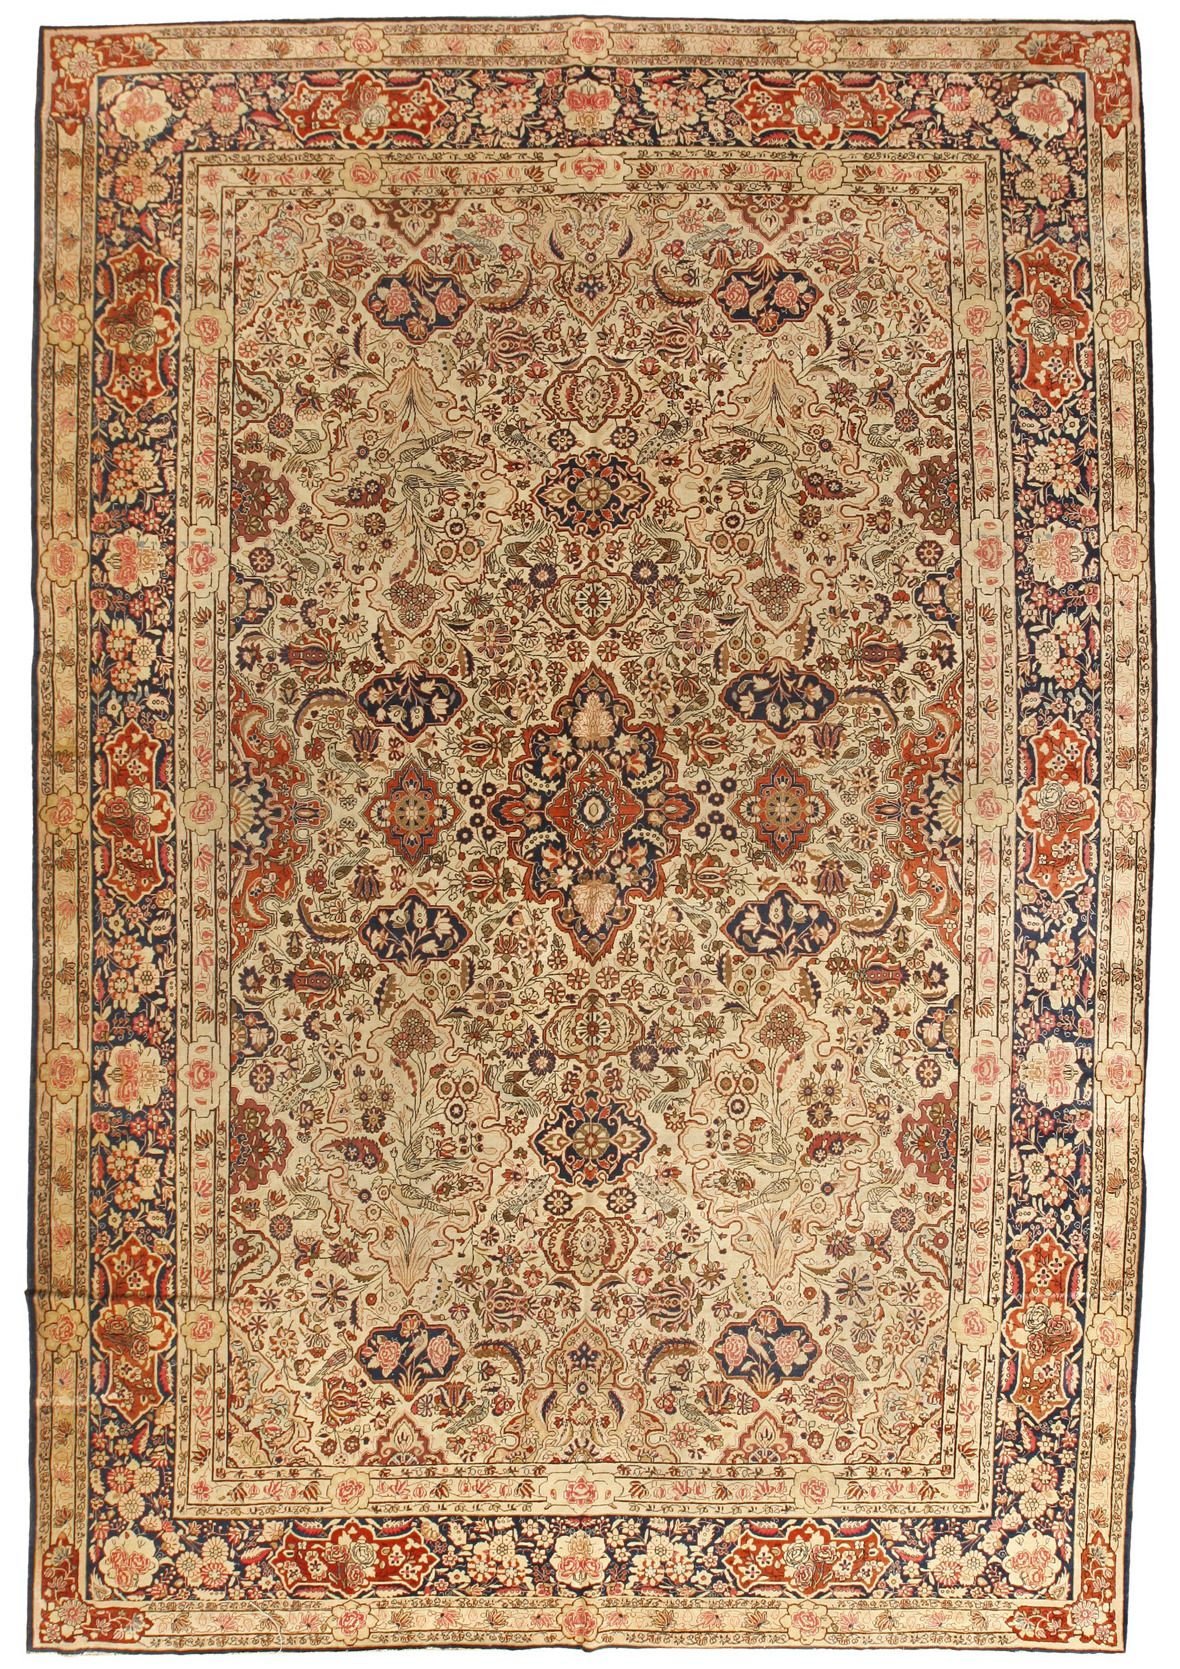 Antique Dabir Kashan Carpet Antique Rugs And Carpets In 2020 Carpet Rugs Shaw Carpet